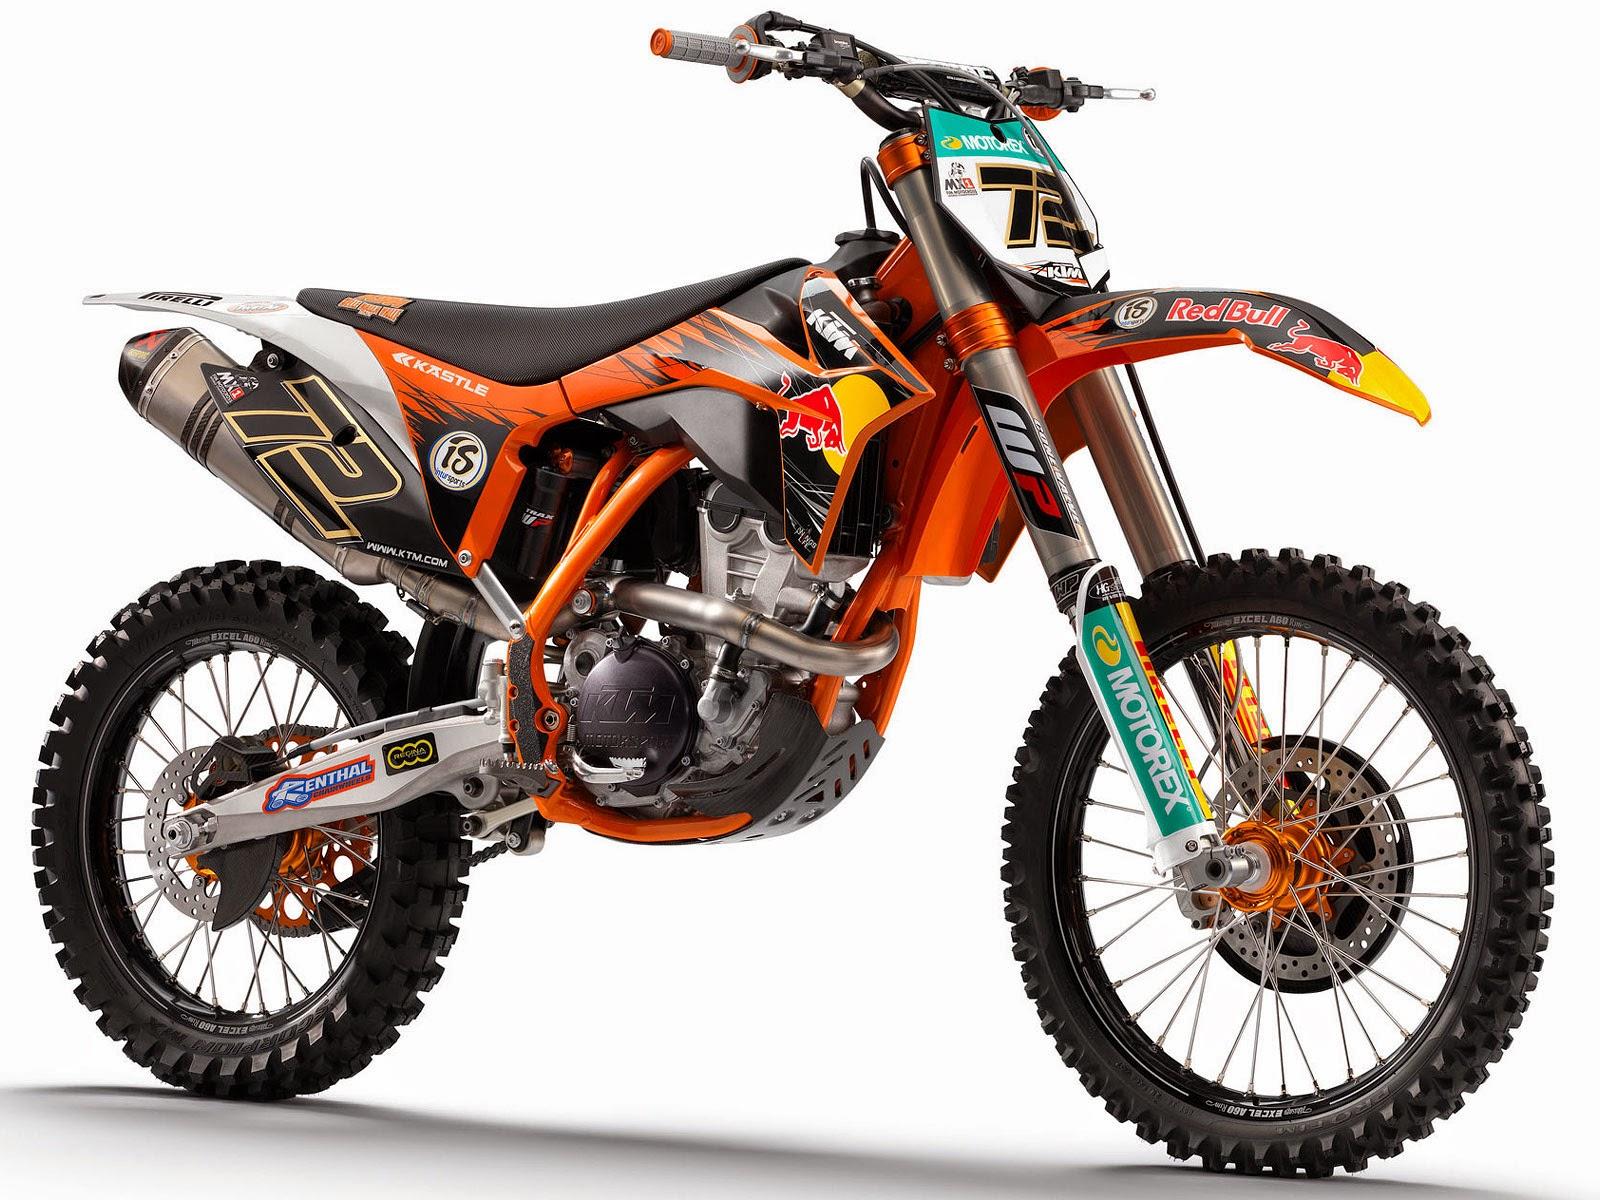 84 Modifikasi Motor Cross Klx Terunik Kucur Motor